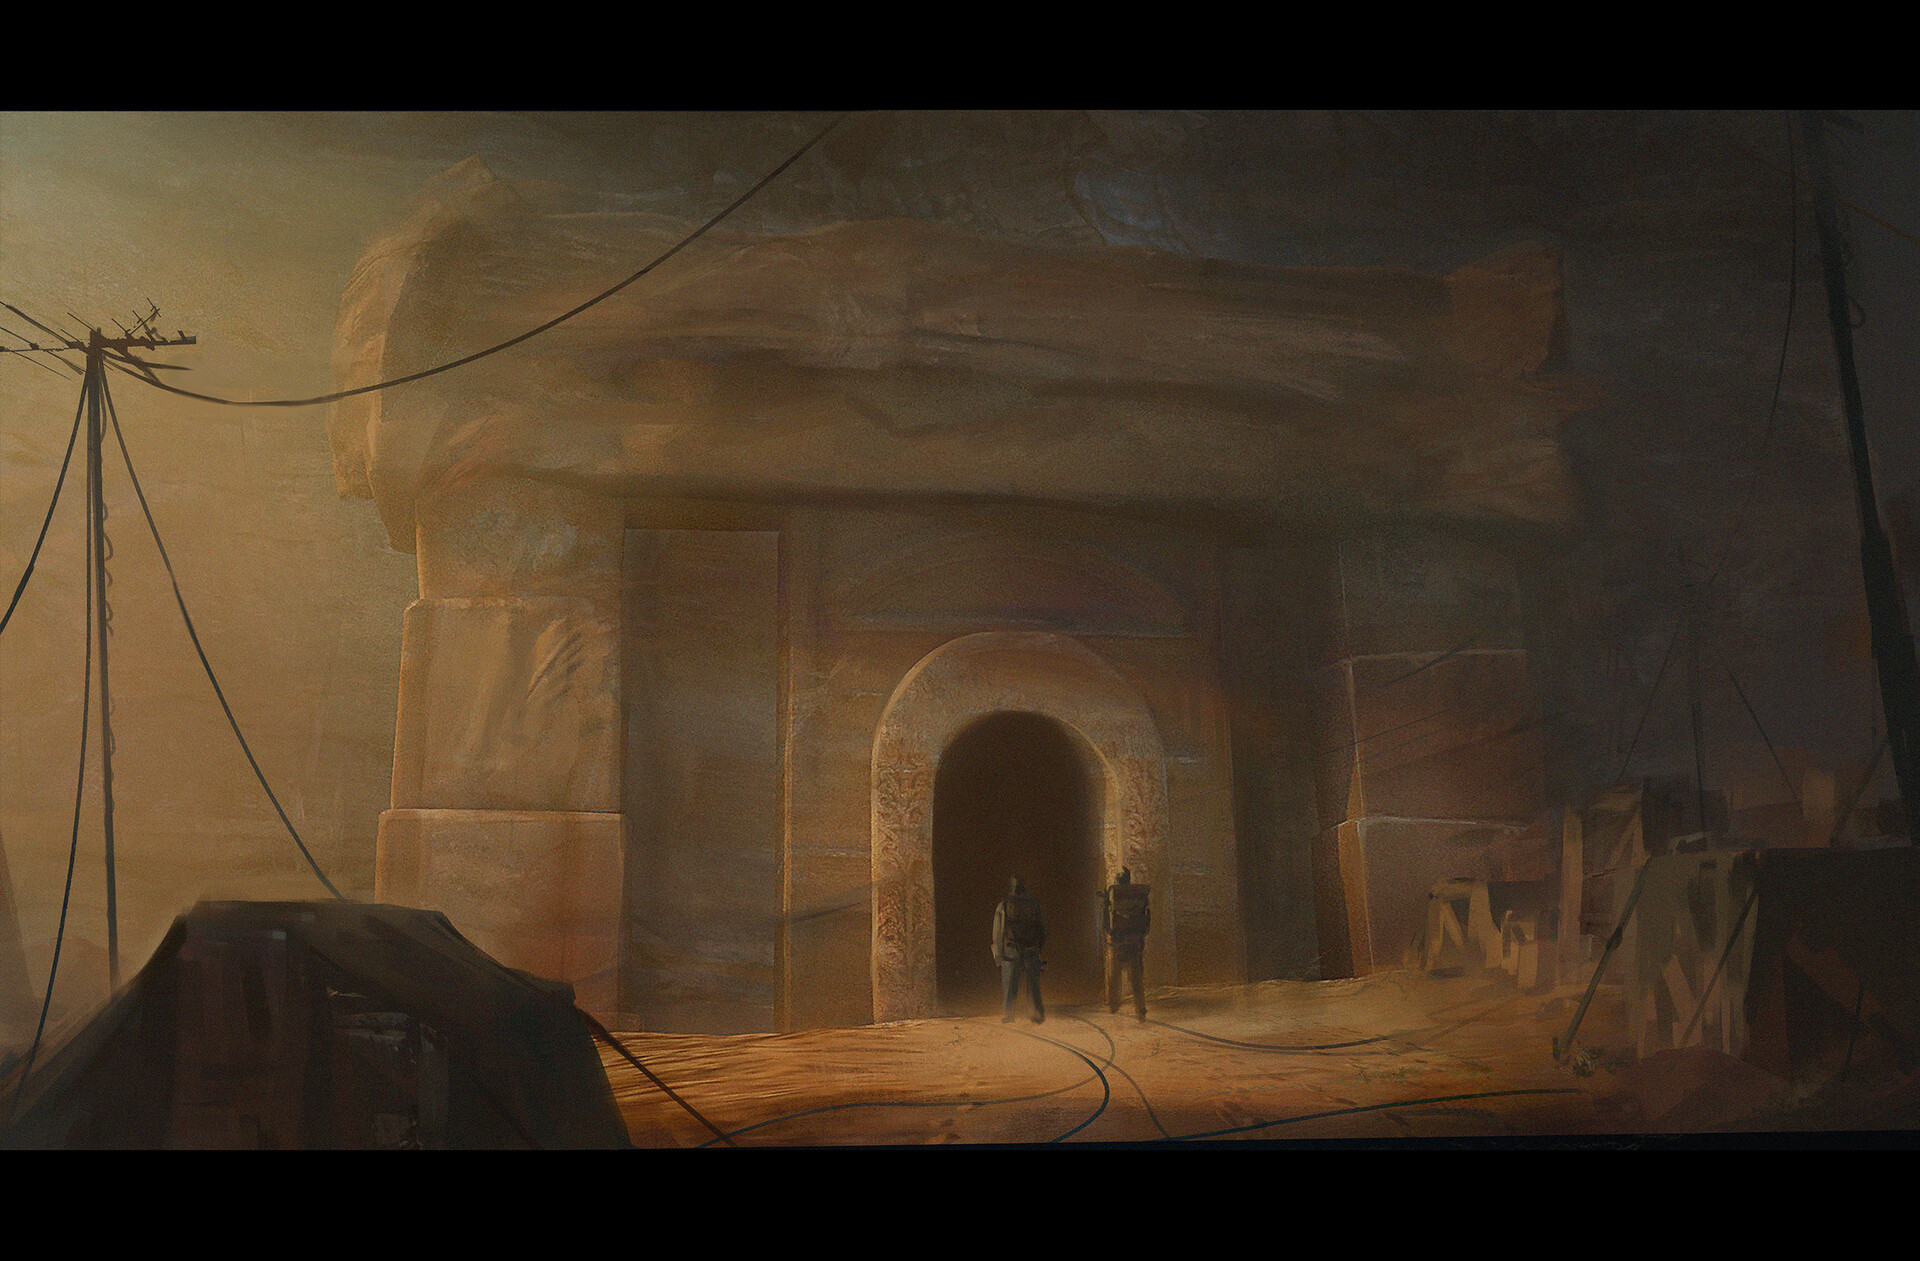 benjamin-gallego-ruins-city.jpg